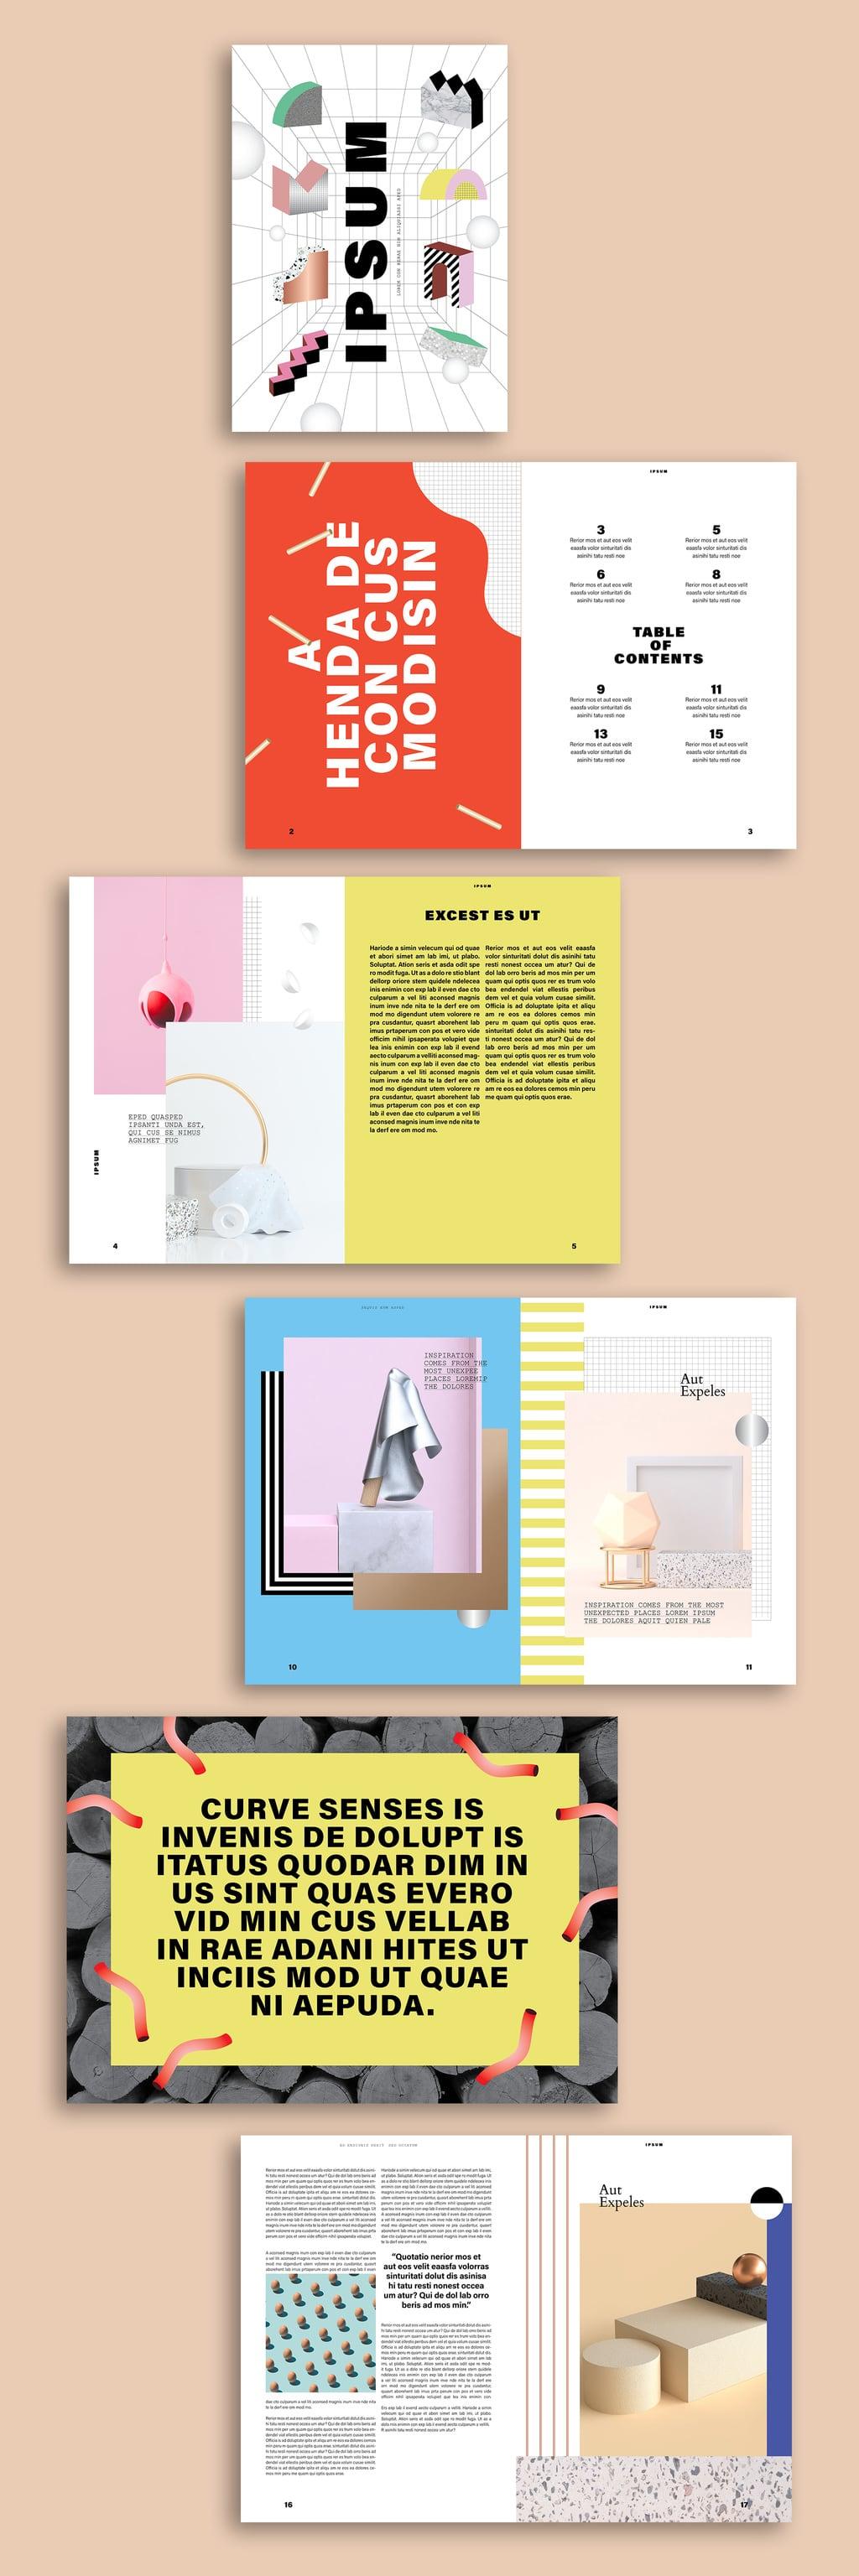 InDesign Brochure Templates Free: Eye-catching Magazine Layout